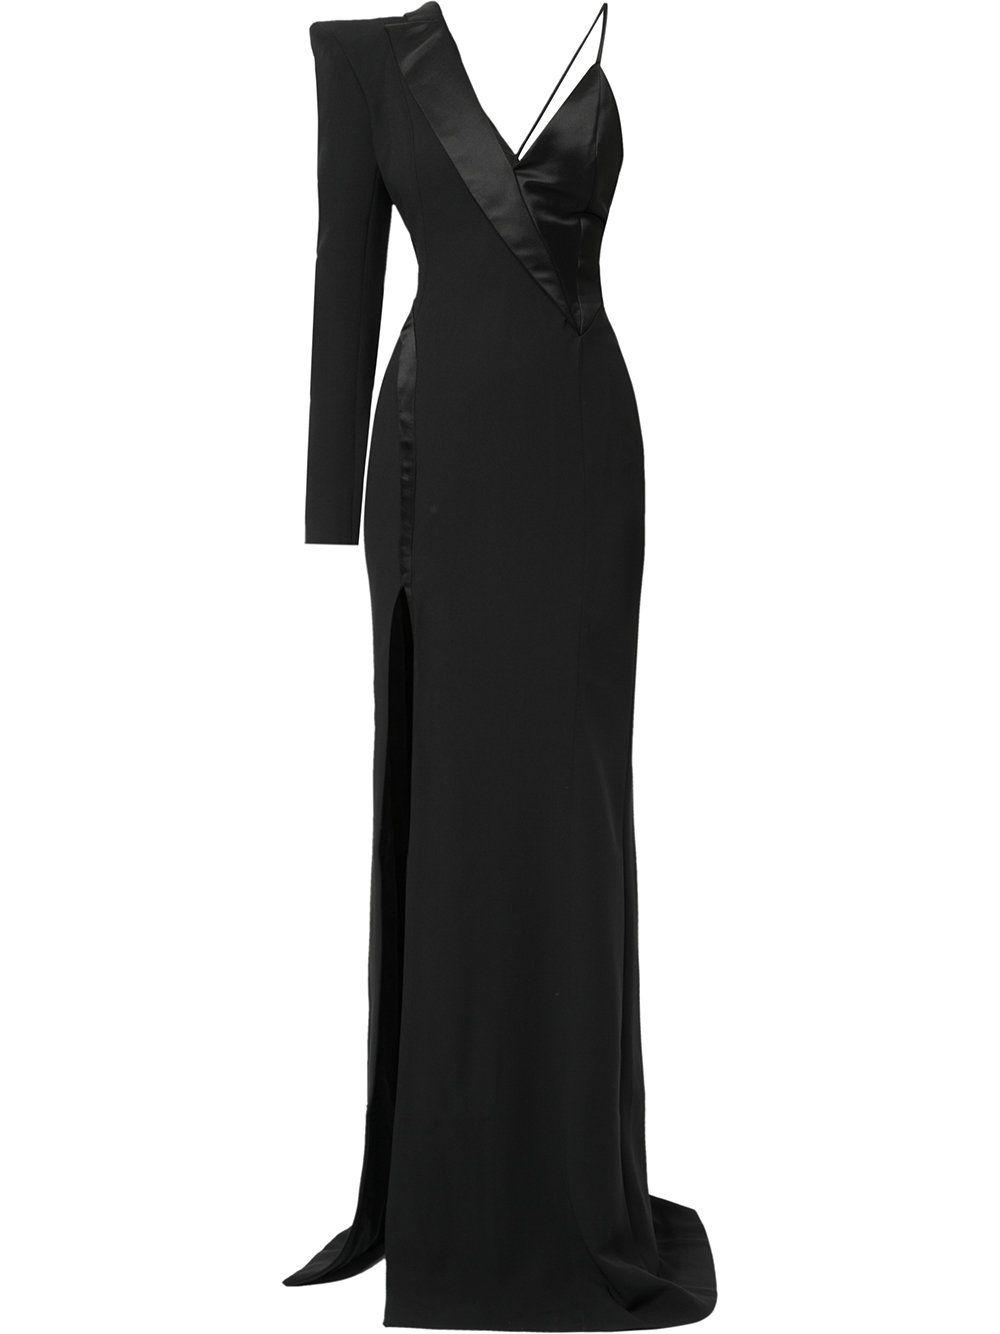 Mugler asymmetric tuxedo gown   Dresses   Pinterest   Gowns and Woman